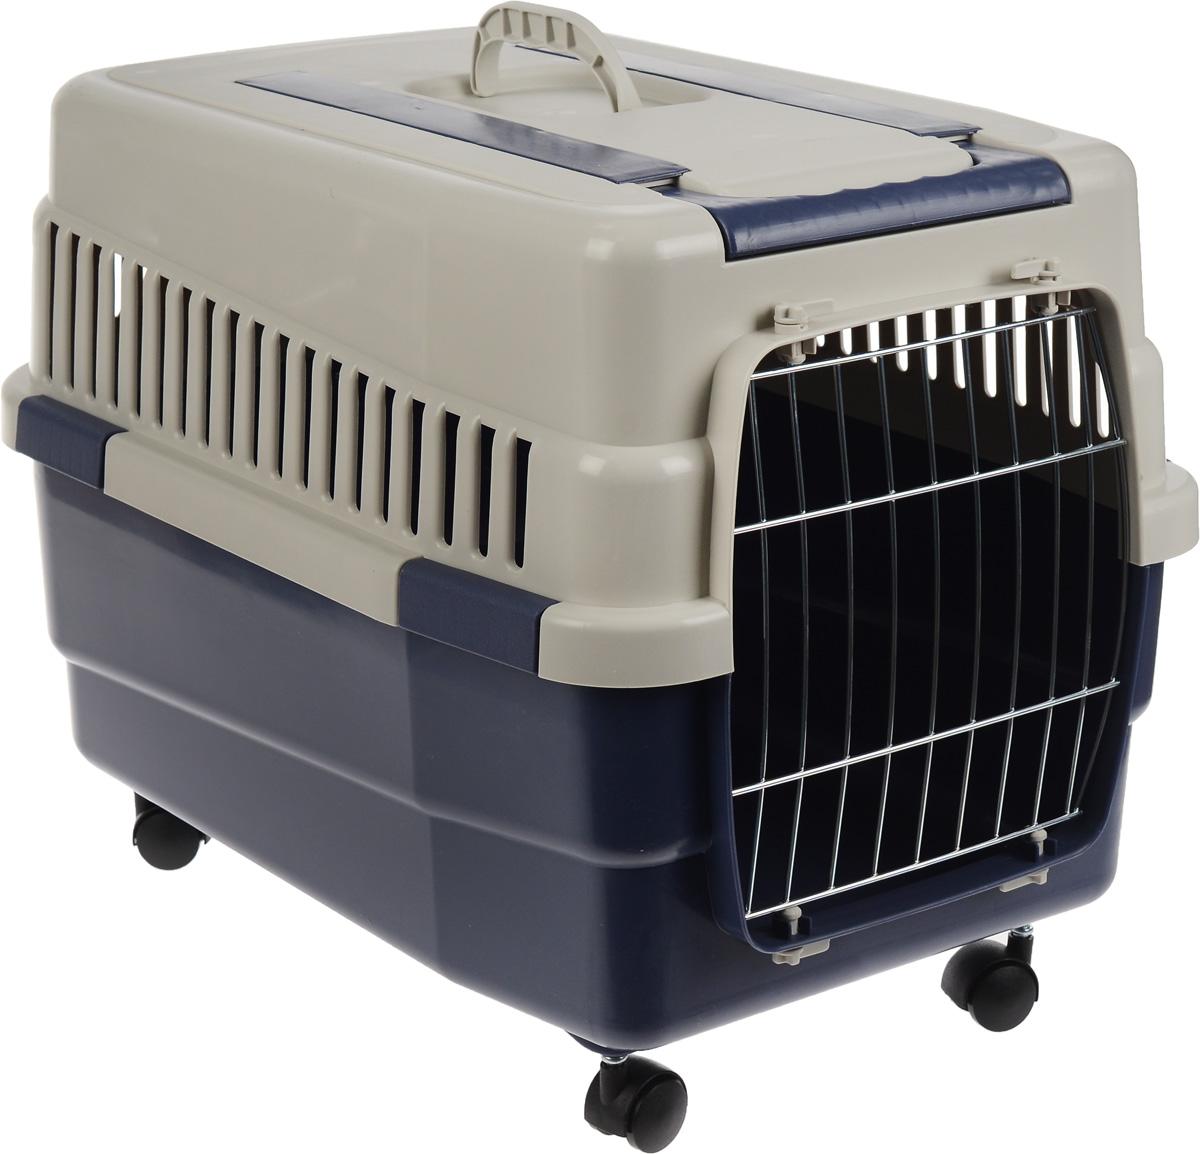 Переноска для животных IMAC Kim 60, на колесах, цвет: светло-серый, синий, 60 х 40 х 45 см переноска для животных imac linus 50х32х34 5см коралловая